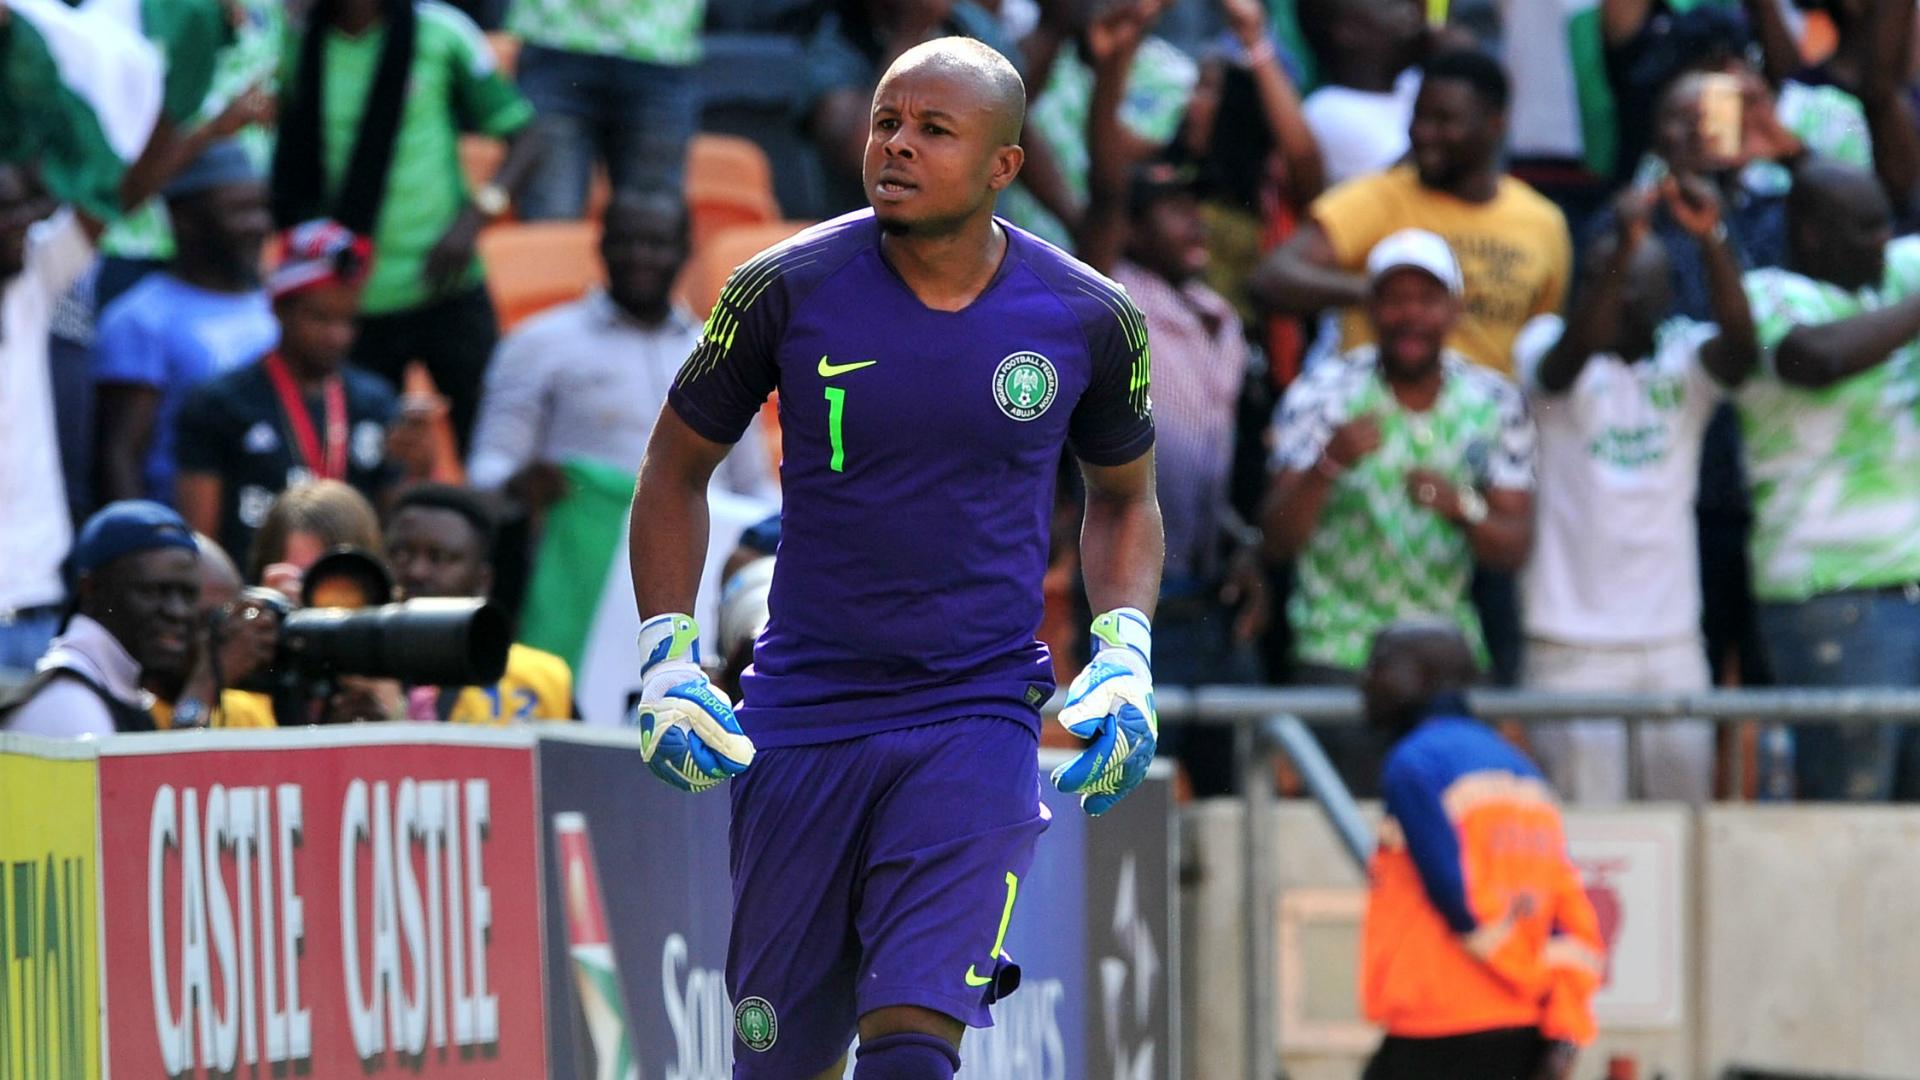 EXCLUSIVE: Slimani was tougher to face than Mahrez - Nigeria's Ezenwa